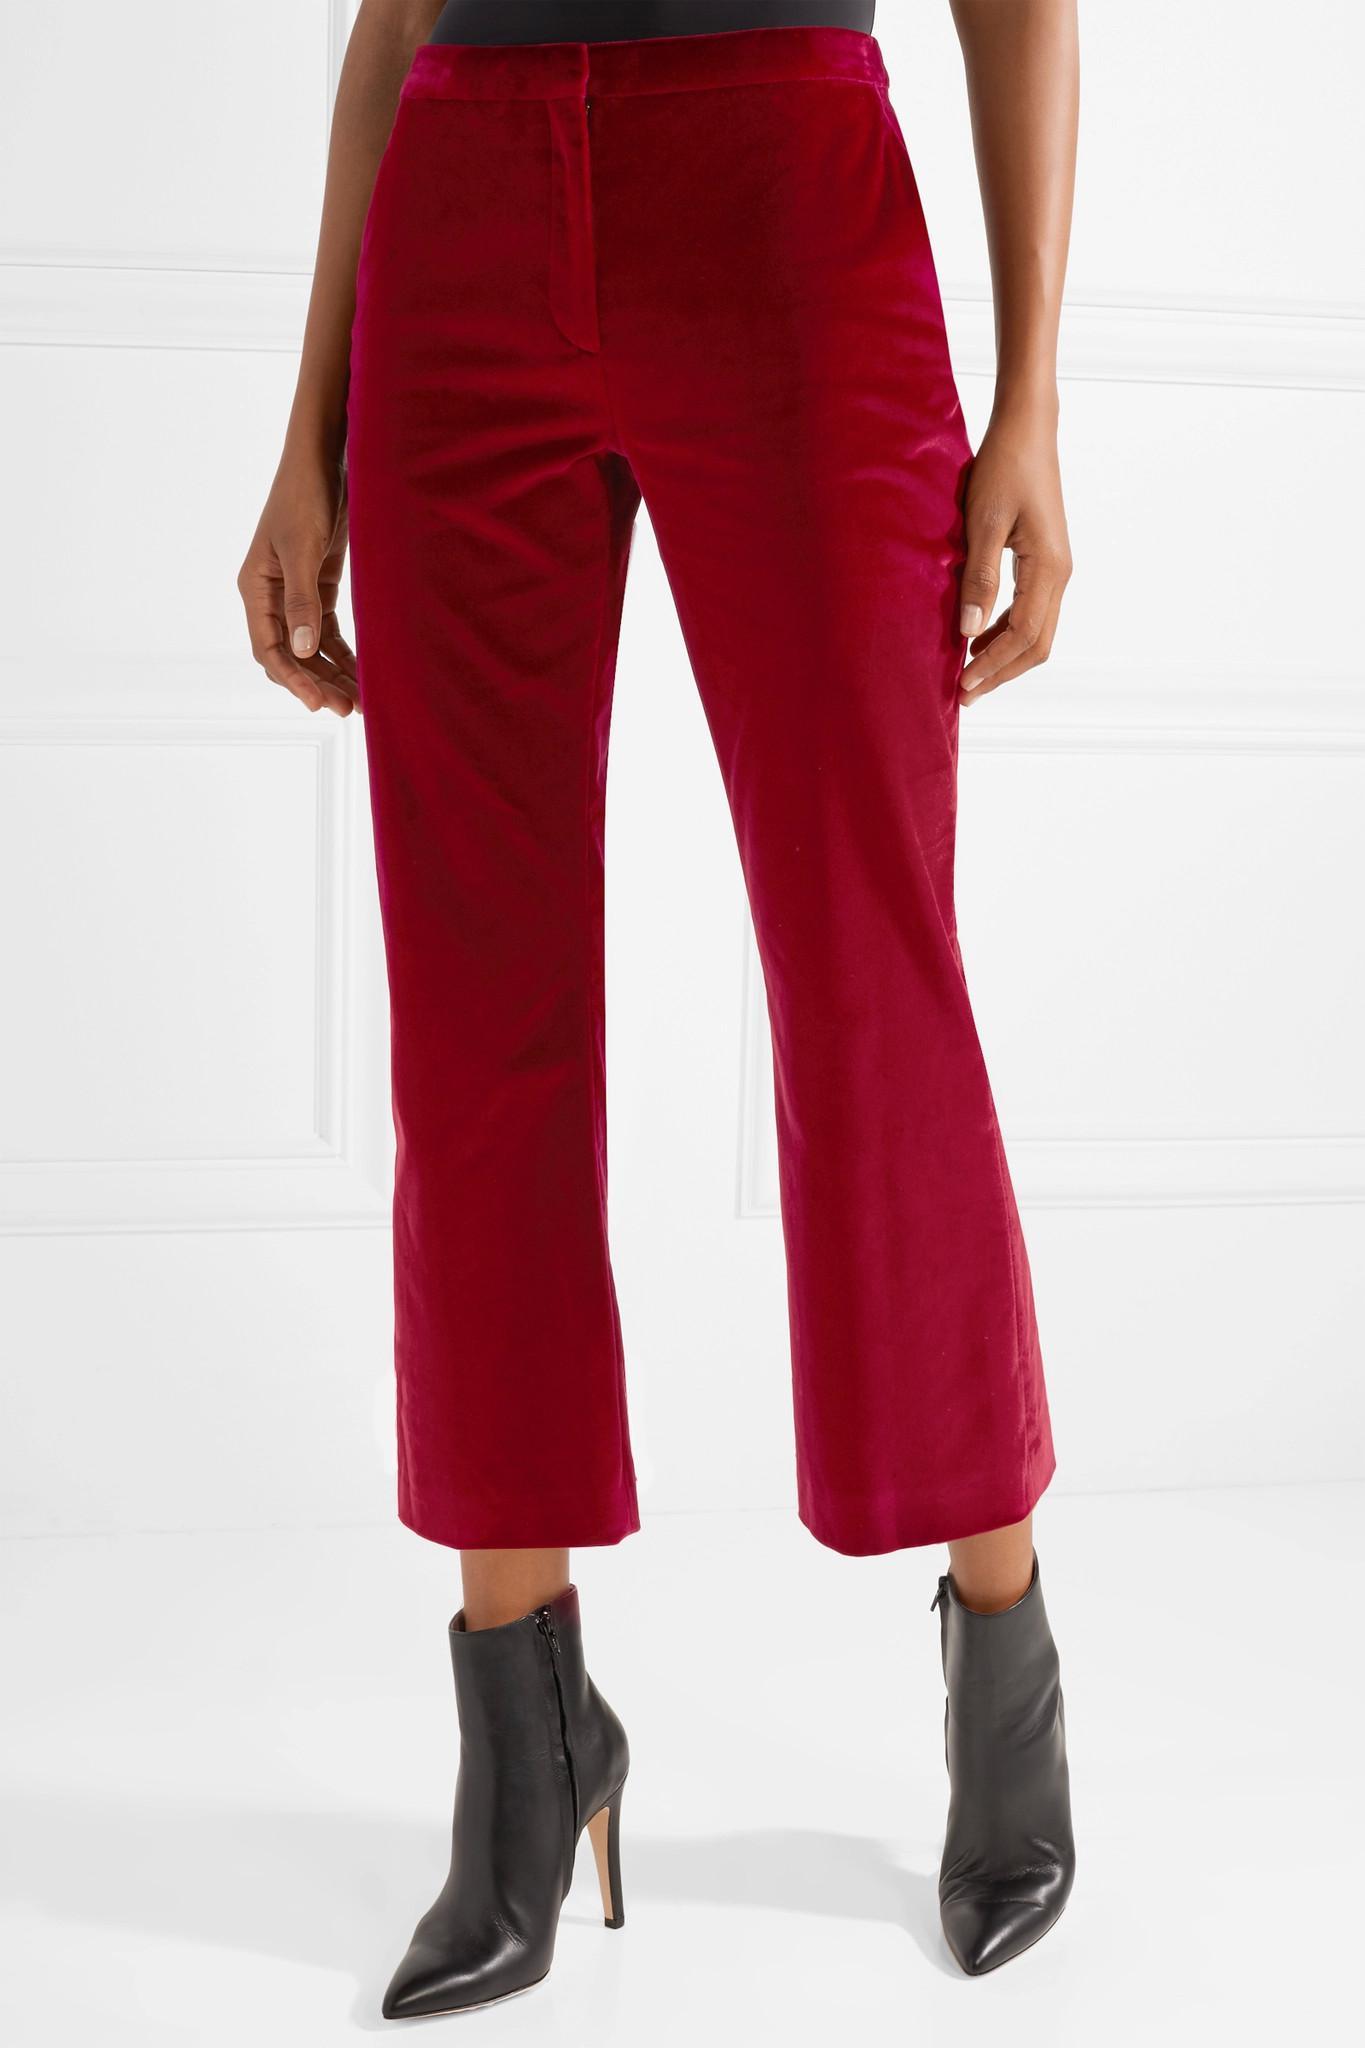 Supply Velvet trousers Altuzarra Visa Payment Cheap Price R8Phw4ZT5